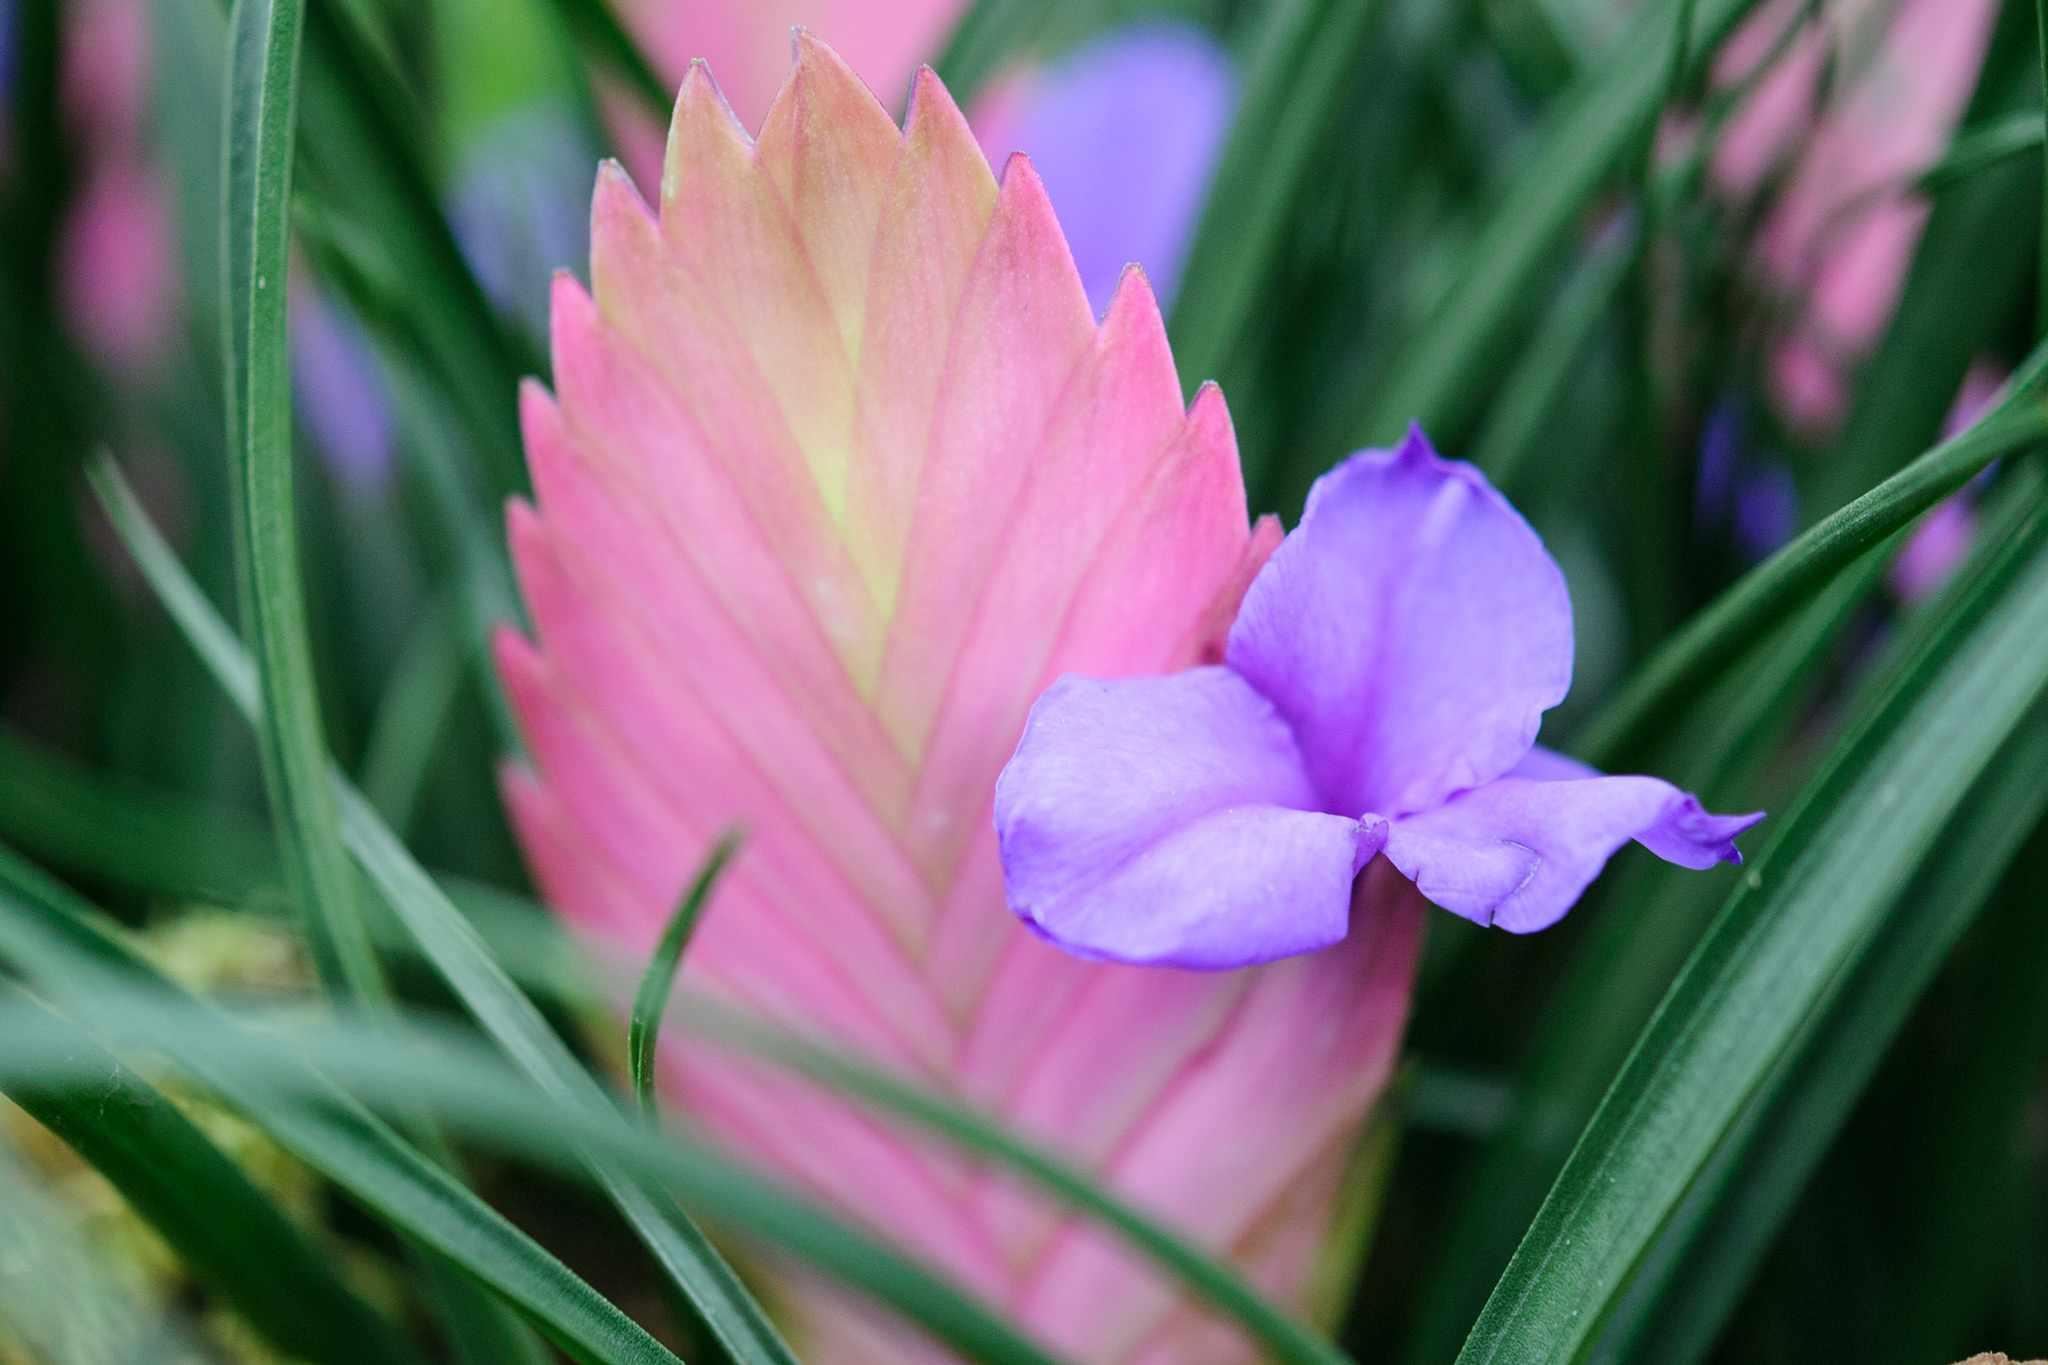 Pink bromeliad flower stalk with mauve/blue flower